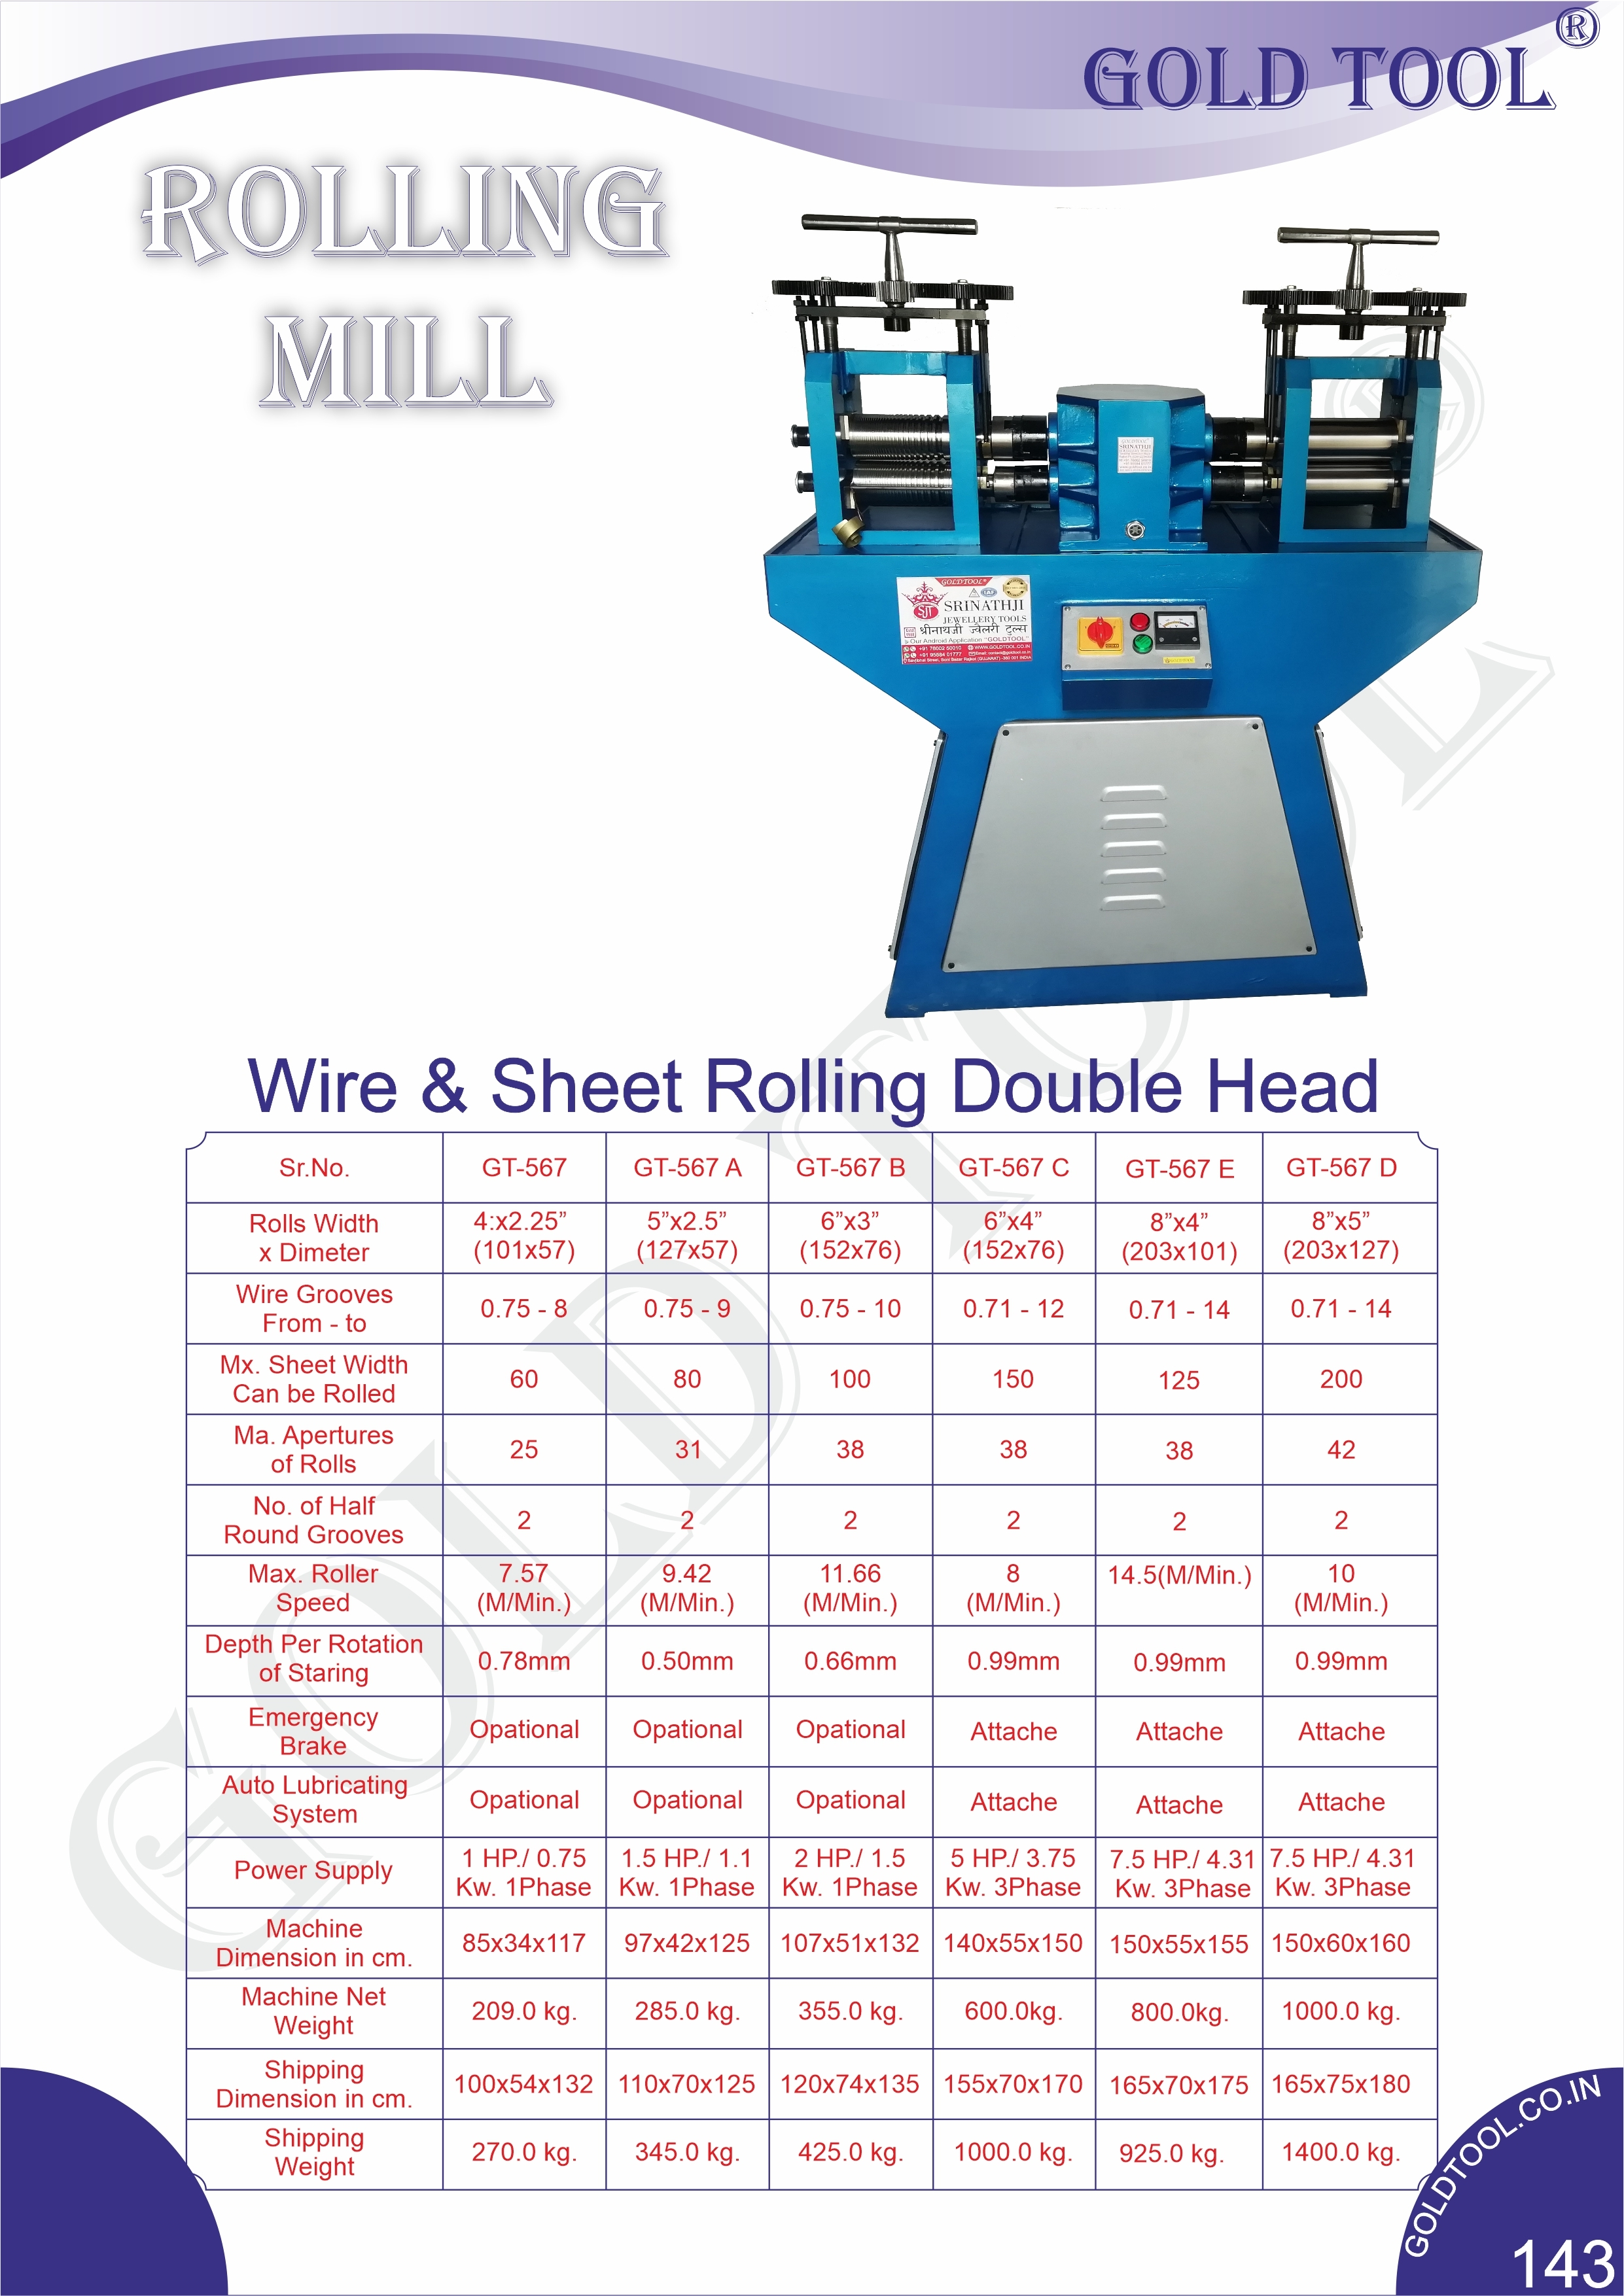 Gold Tool Wire & Sheet Rolling Mill Double Head Rolling Machine Jewelry Marking Machine